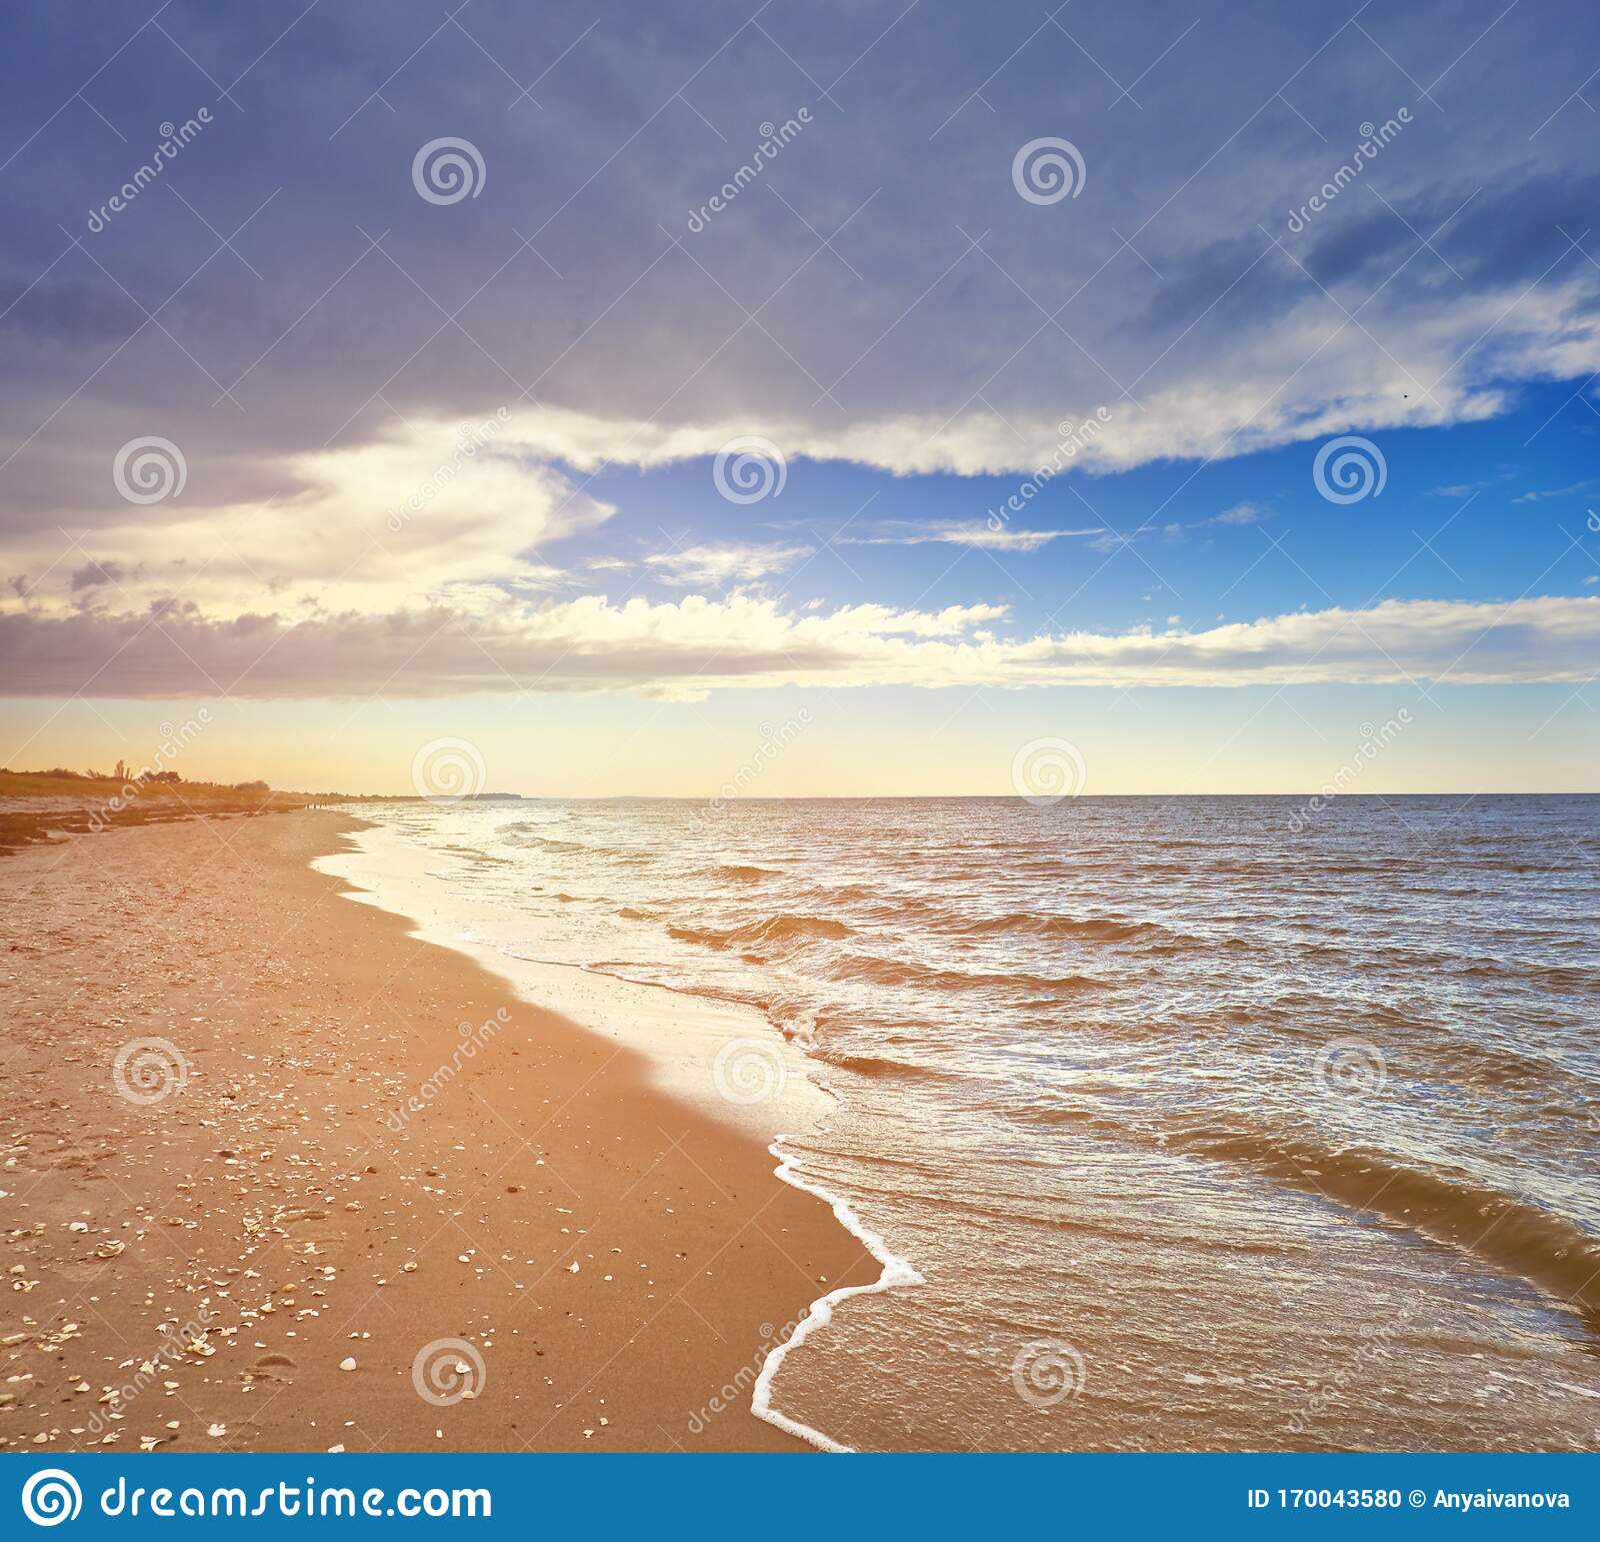 Deserted Island Beach: Deserted Beach On Island Hiddensee In Northern Germany